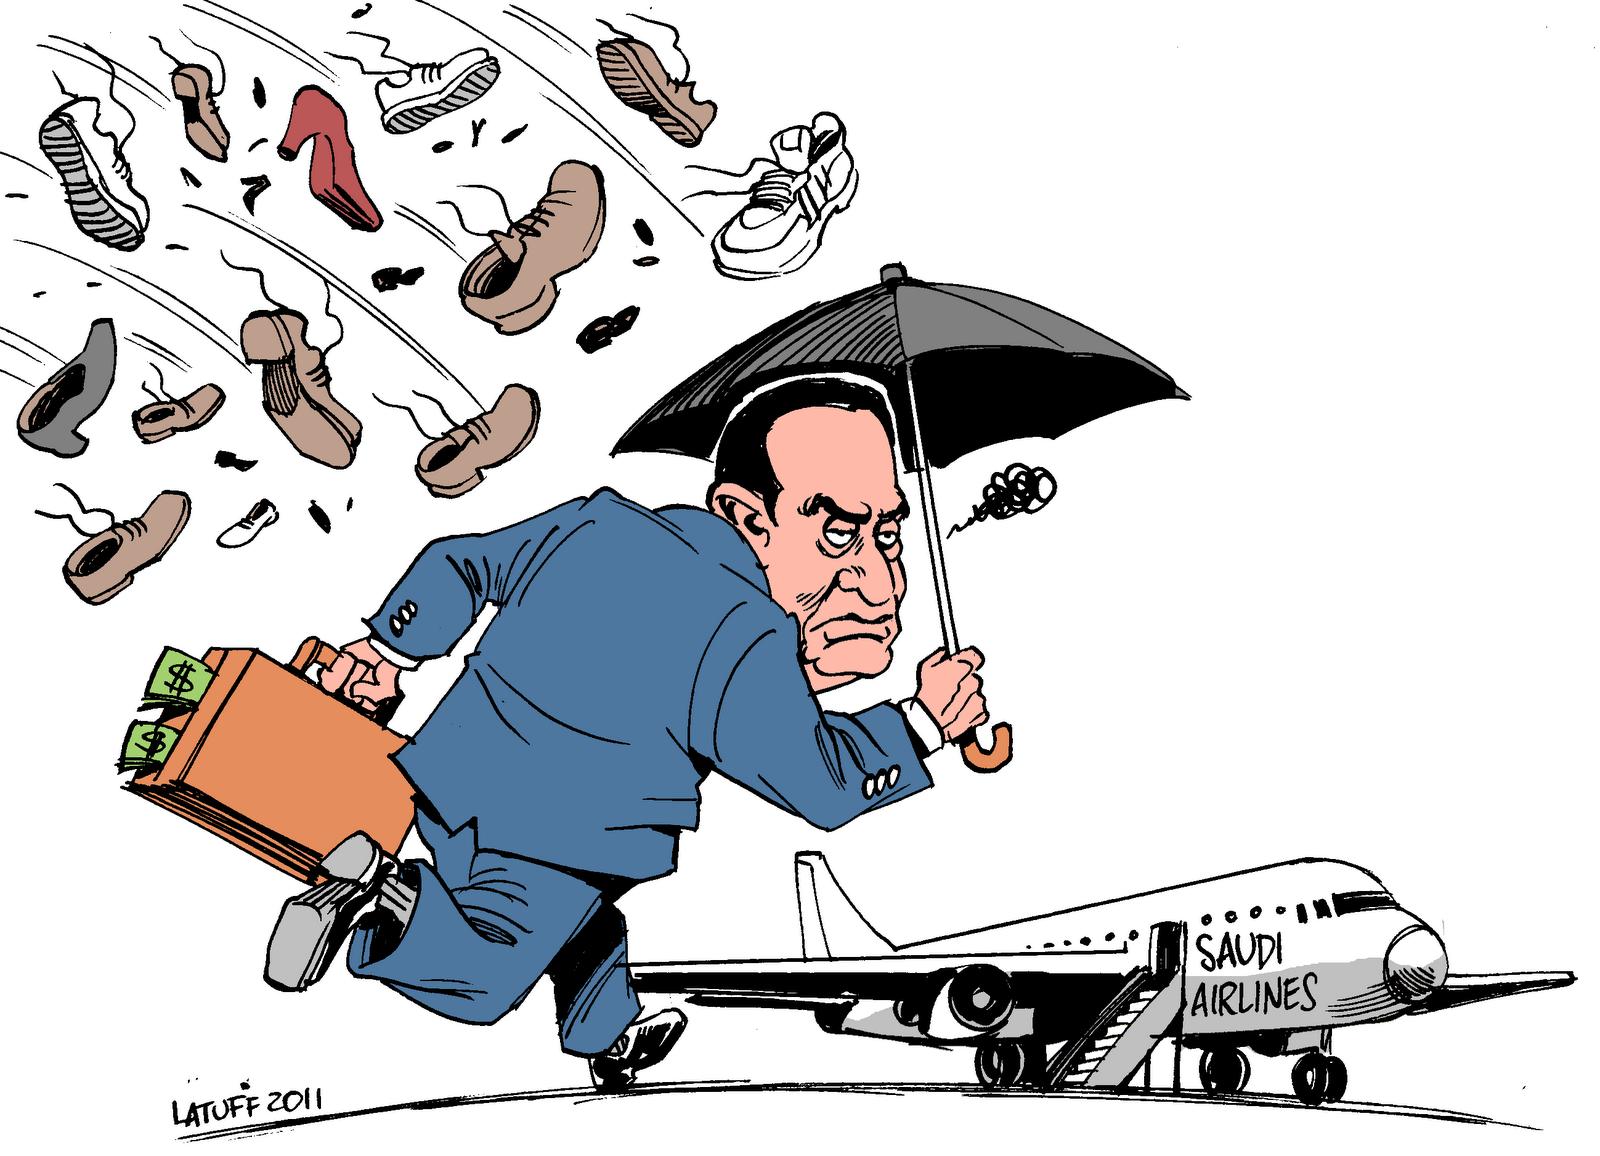 Mubarak, Egipto te despide a zapatazos. Caricatura de Carlos Latuff